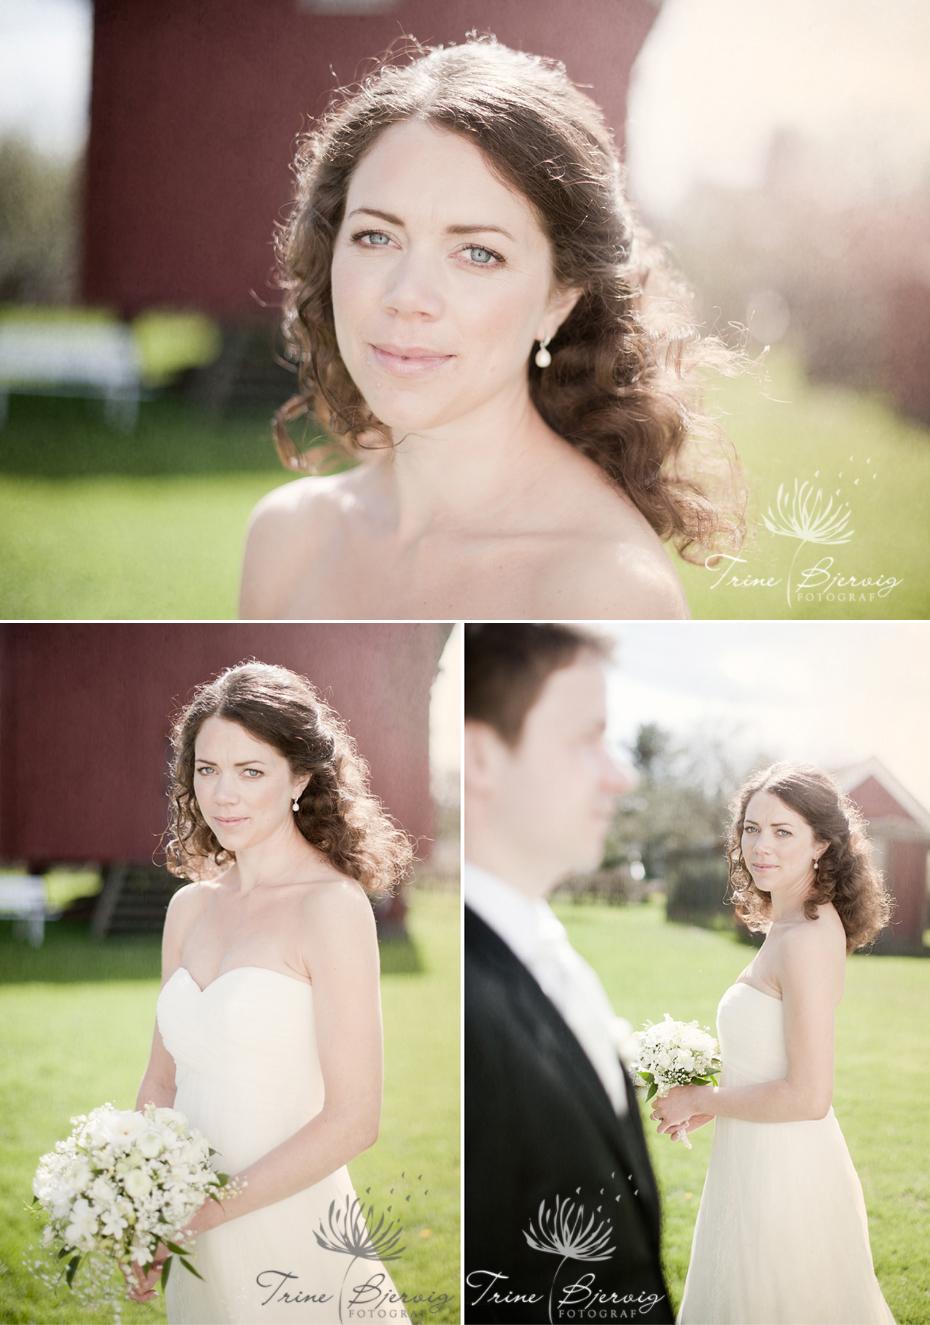 bryllupsbilder fra fossholm herregård - fotografert av bryllupsfotograf Trine Bjervig , Tønsberg, vestfold